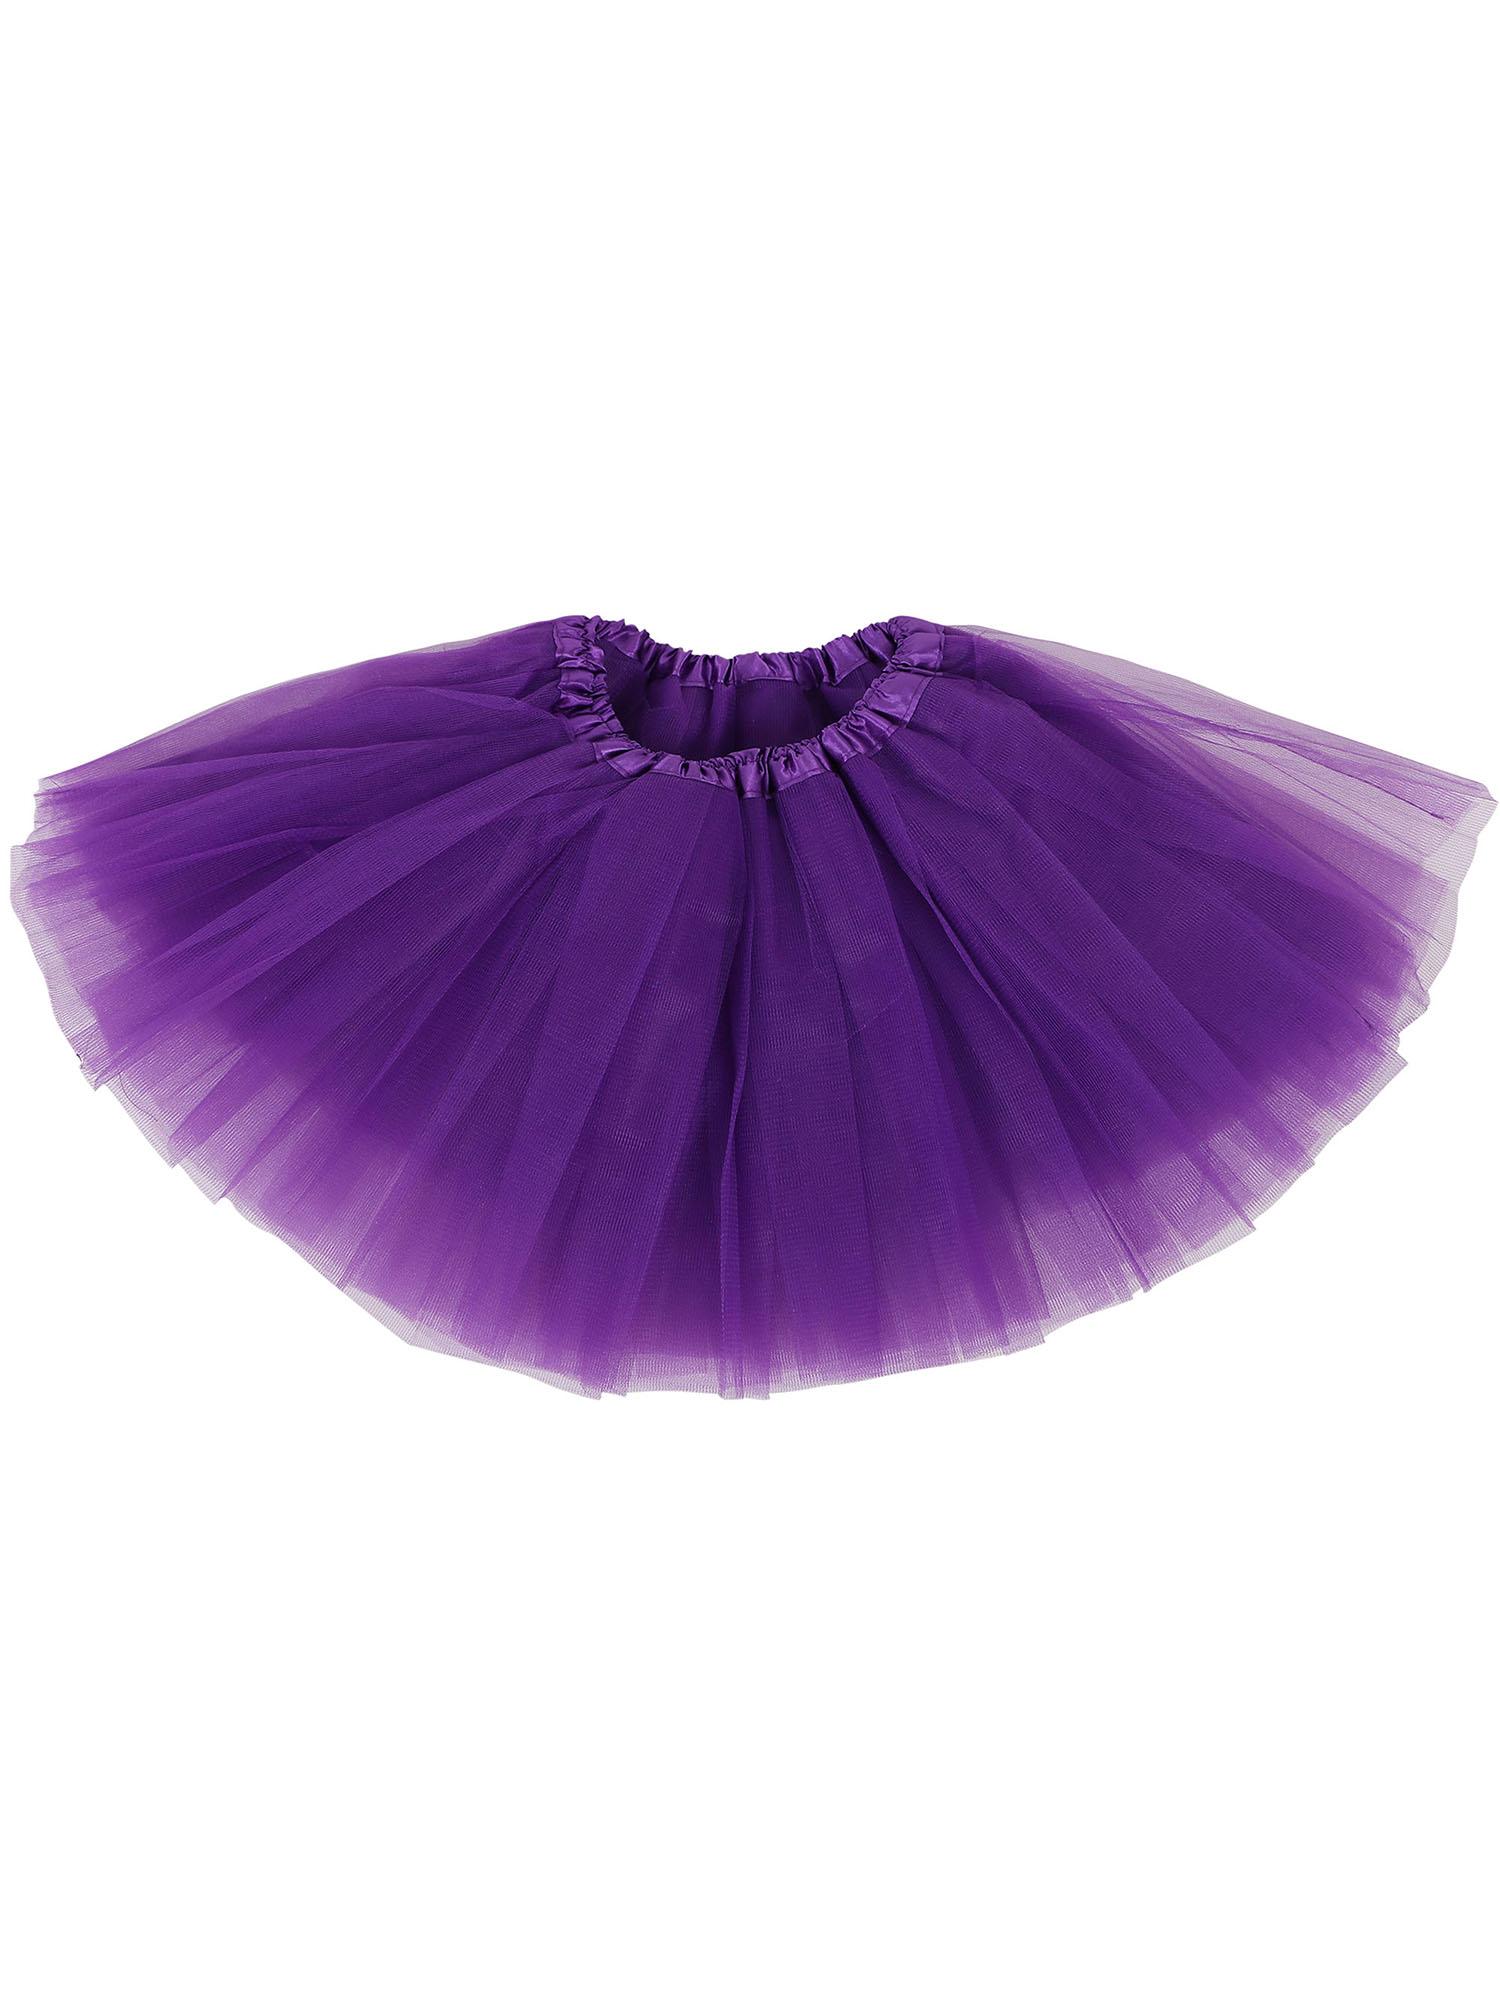 Little Girls Tulle Tutu Skirt Princess Ballet Dance Dress, Purple